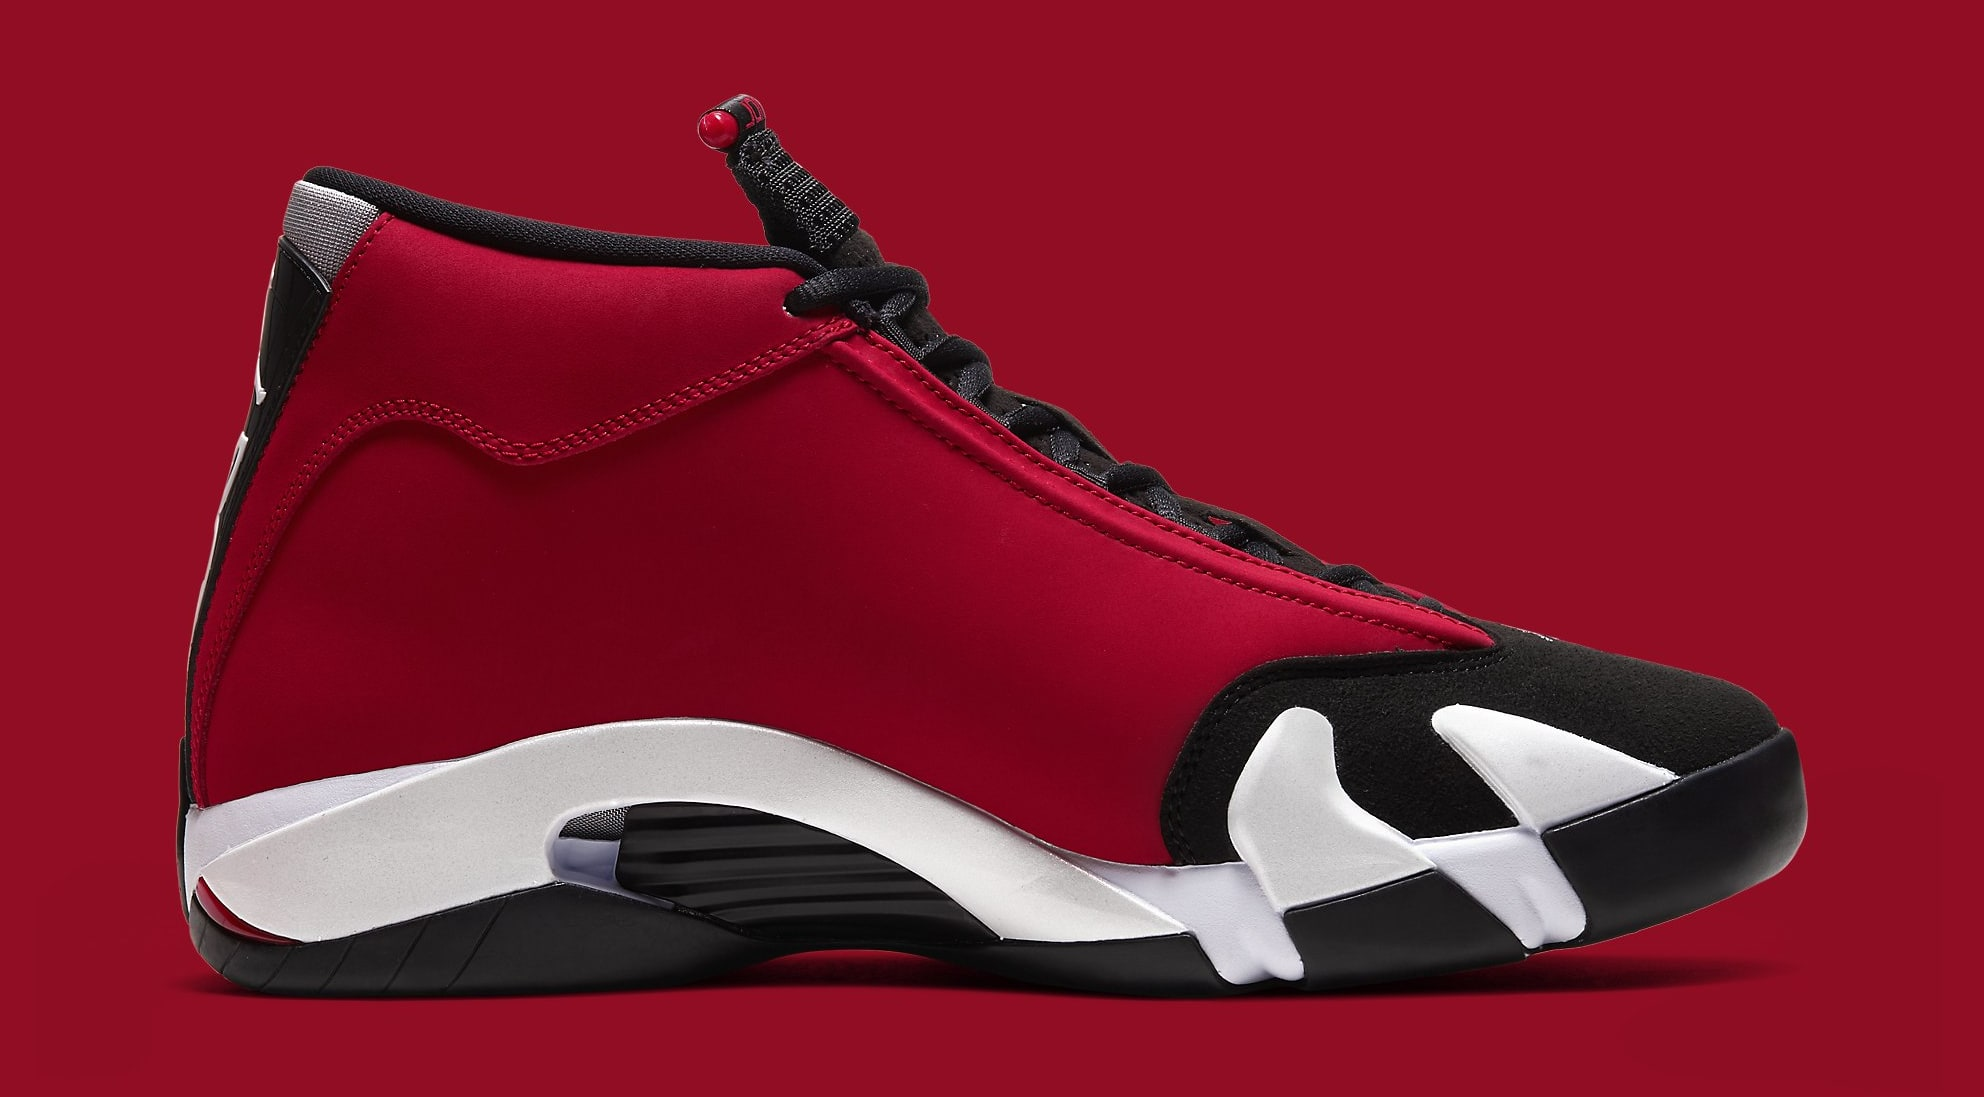 Air Jordan 14 Retro 'Gym Red' 487471-006 Medial